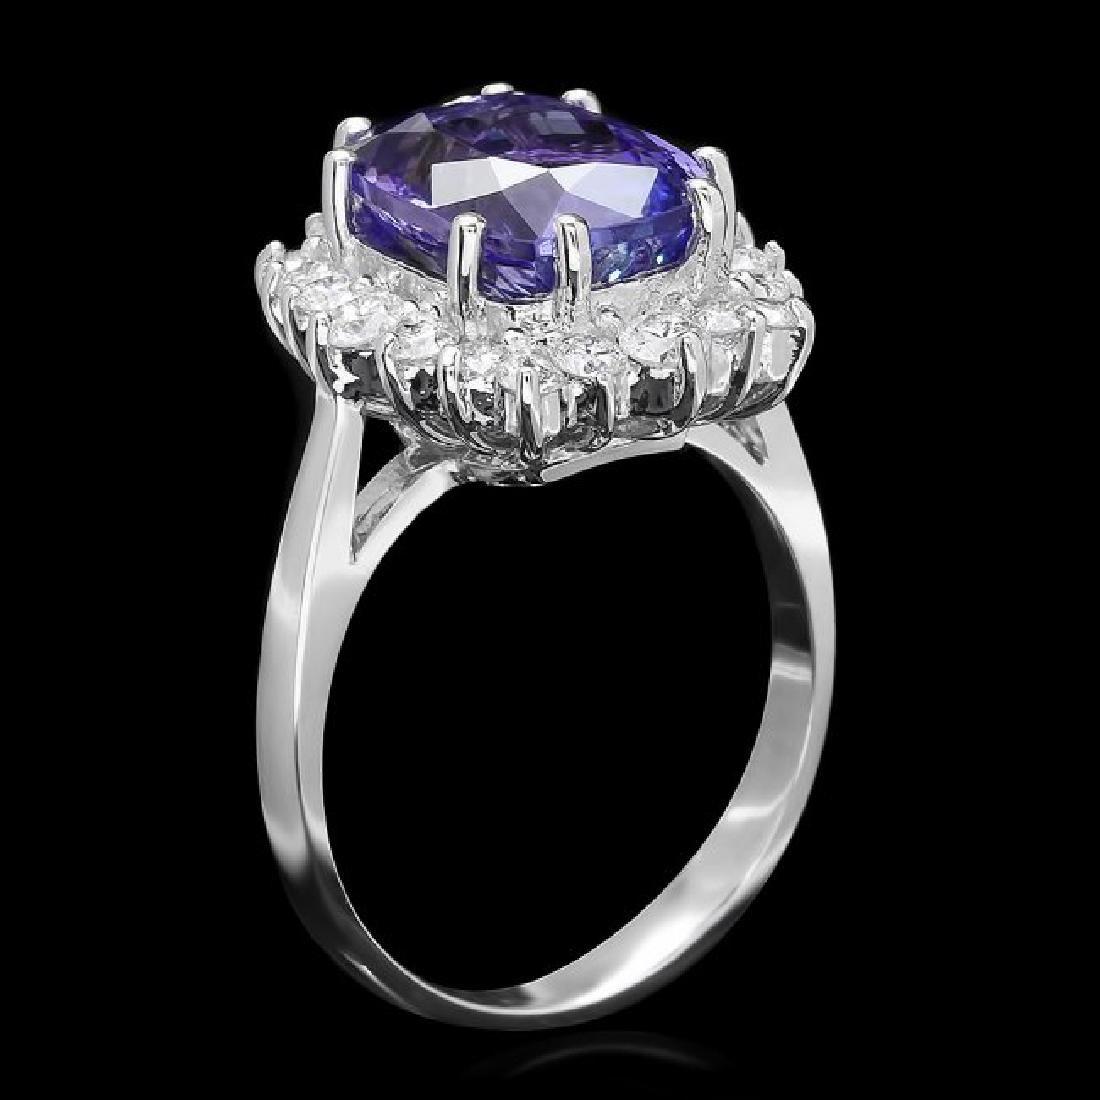 14k Gold 5.0ct Tanzanite 0.85ct Diamond Ring - 2